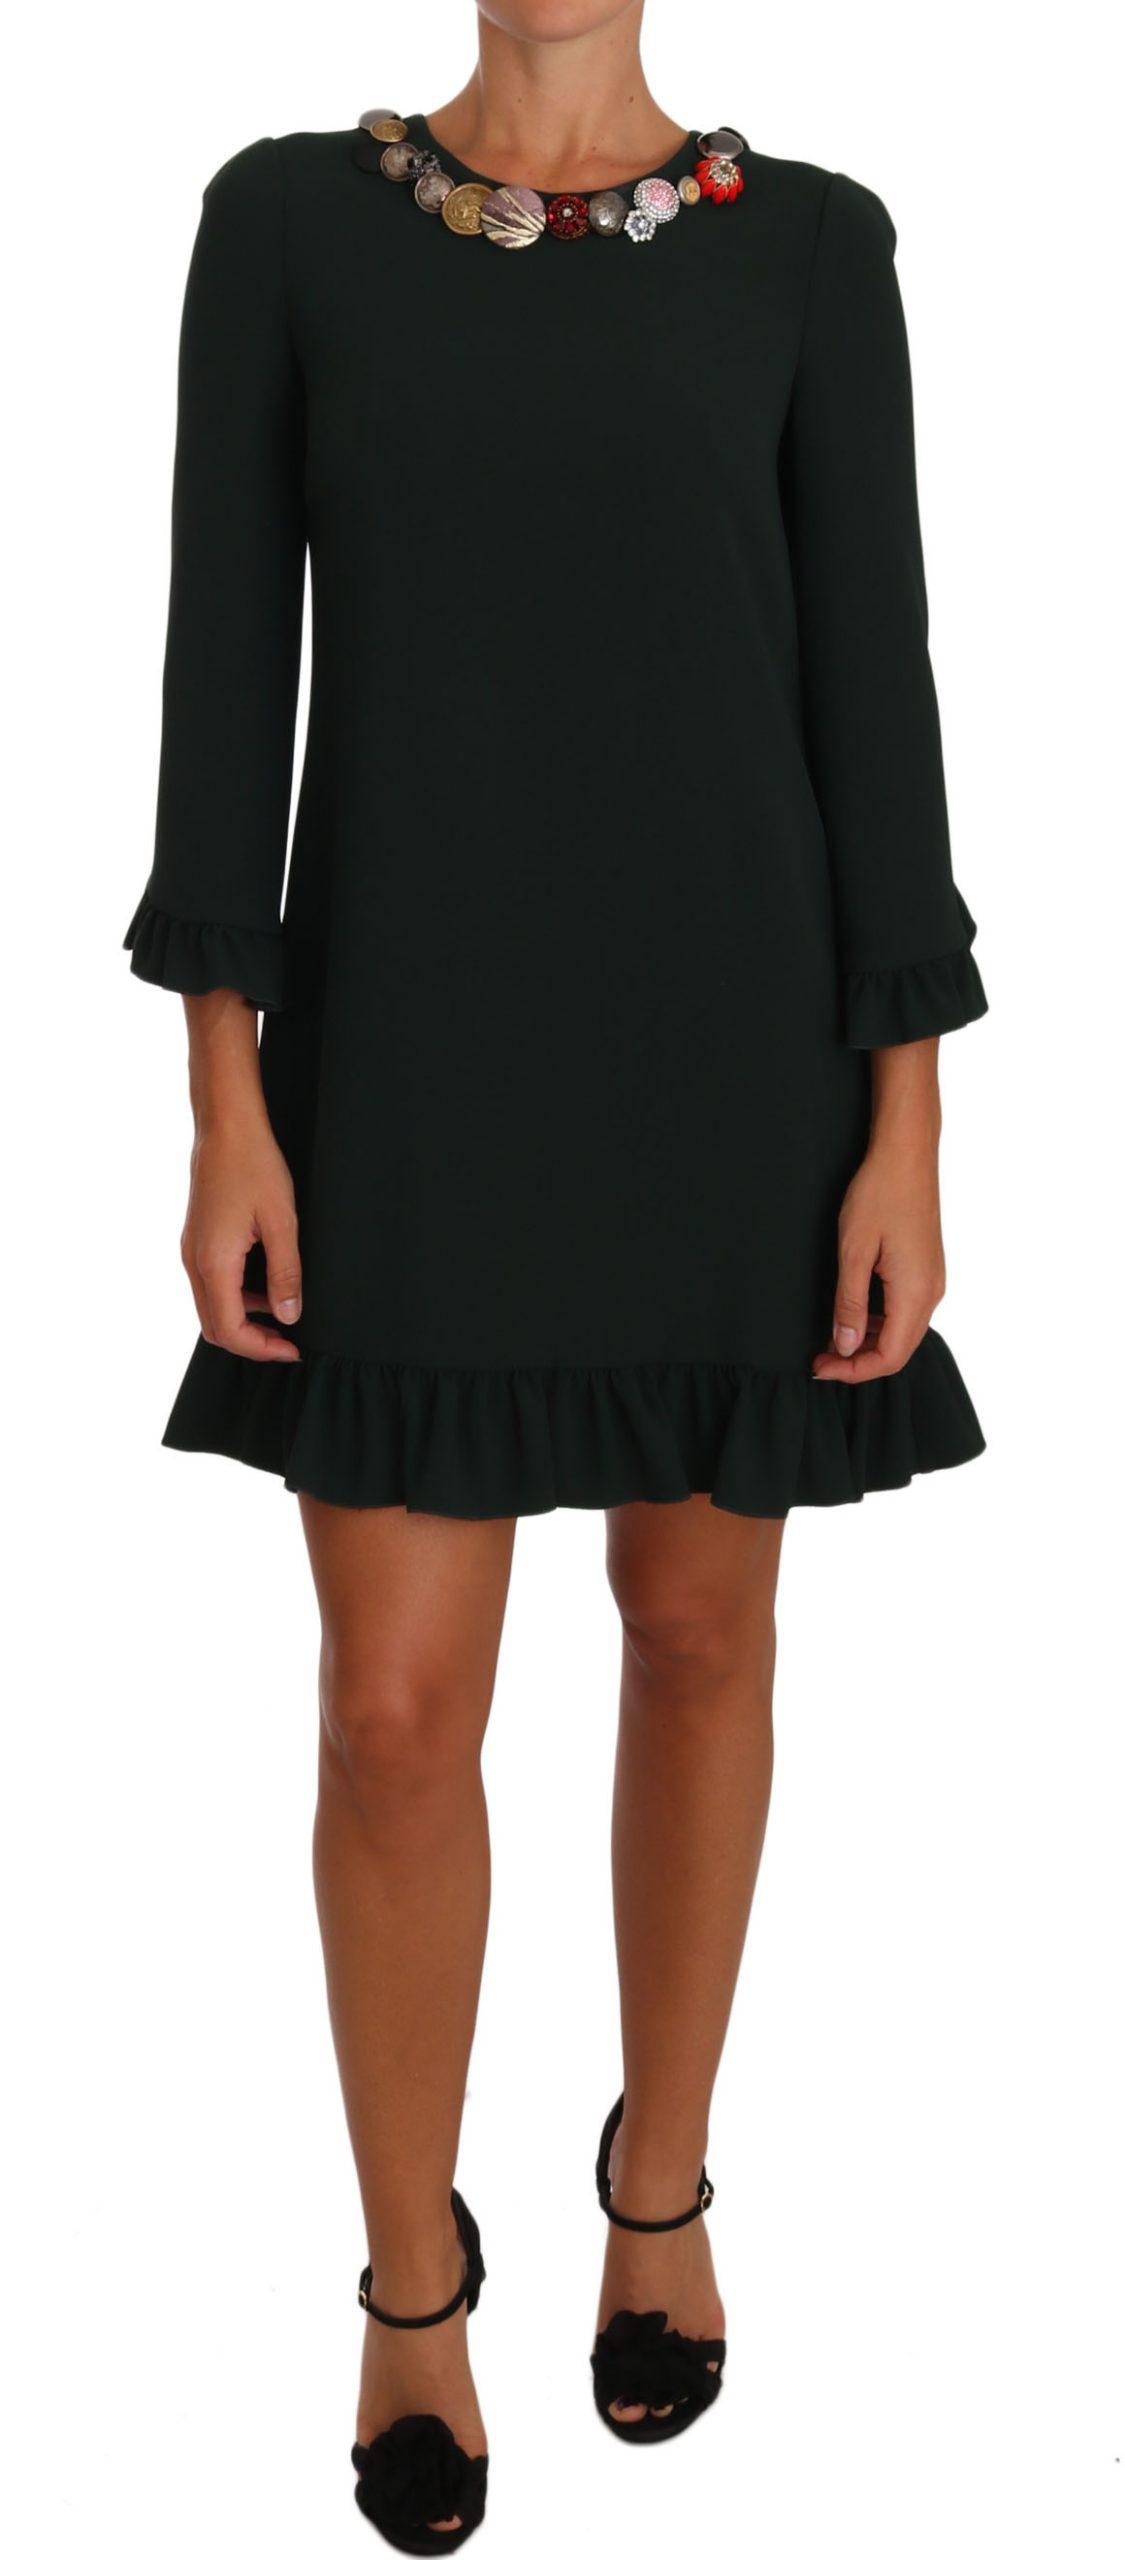 Dolce & Gabbana Women's Stretch A-Line Short Crystal Dress Green DR1411 - IT44 L